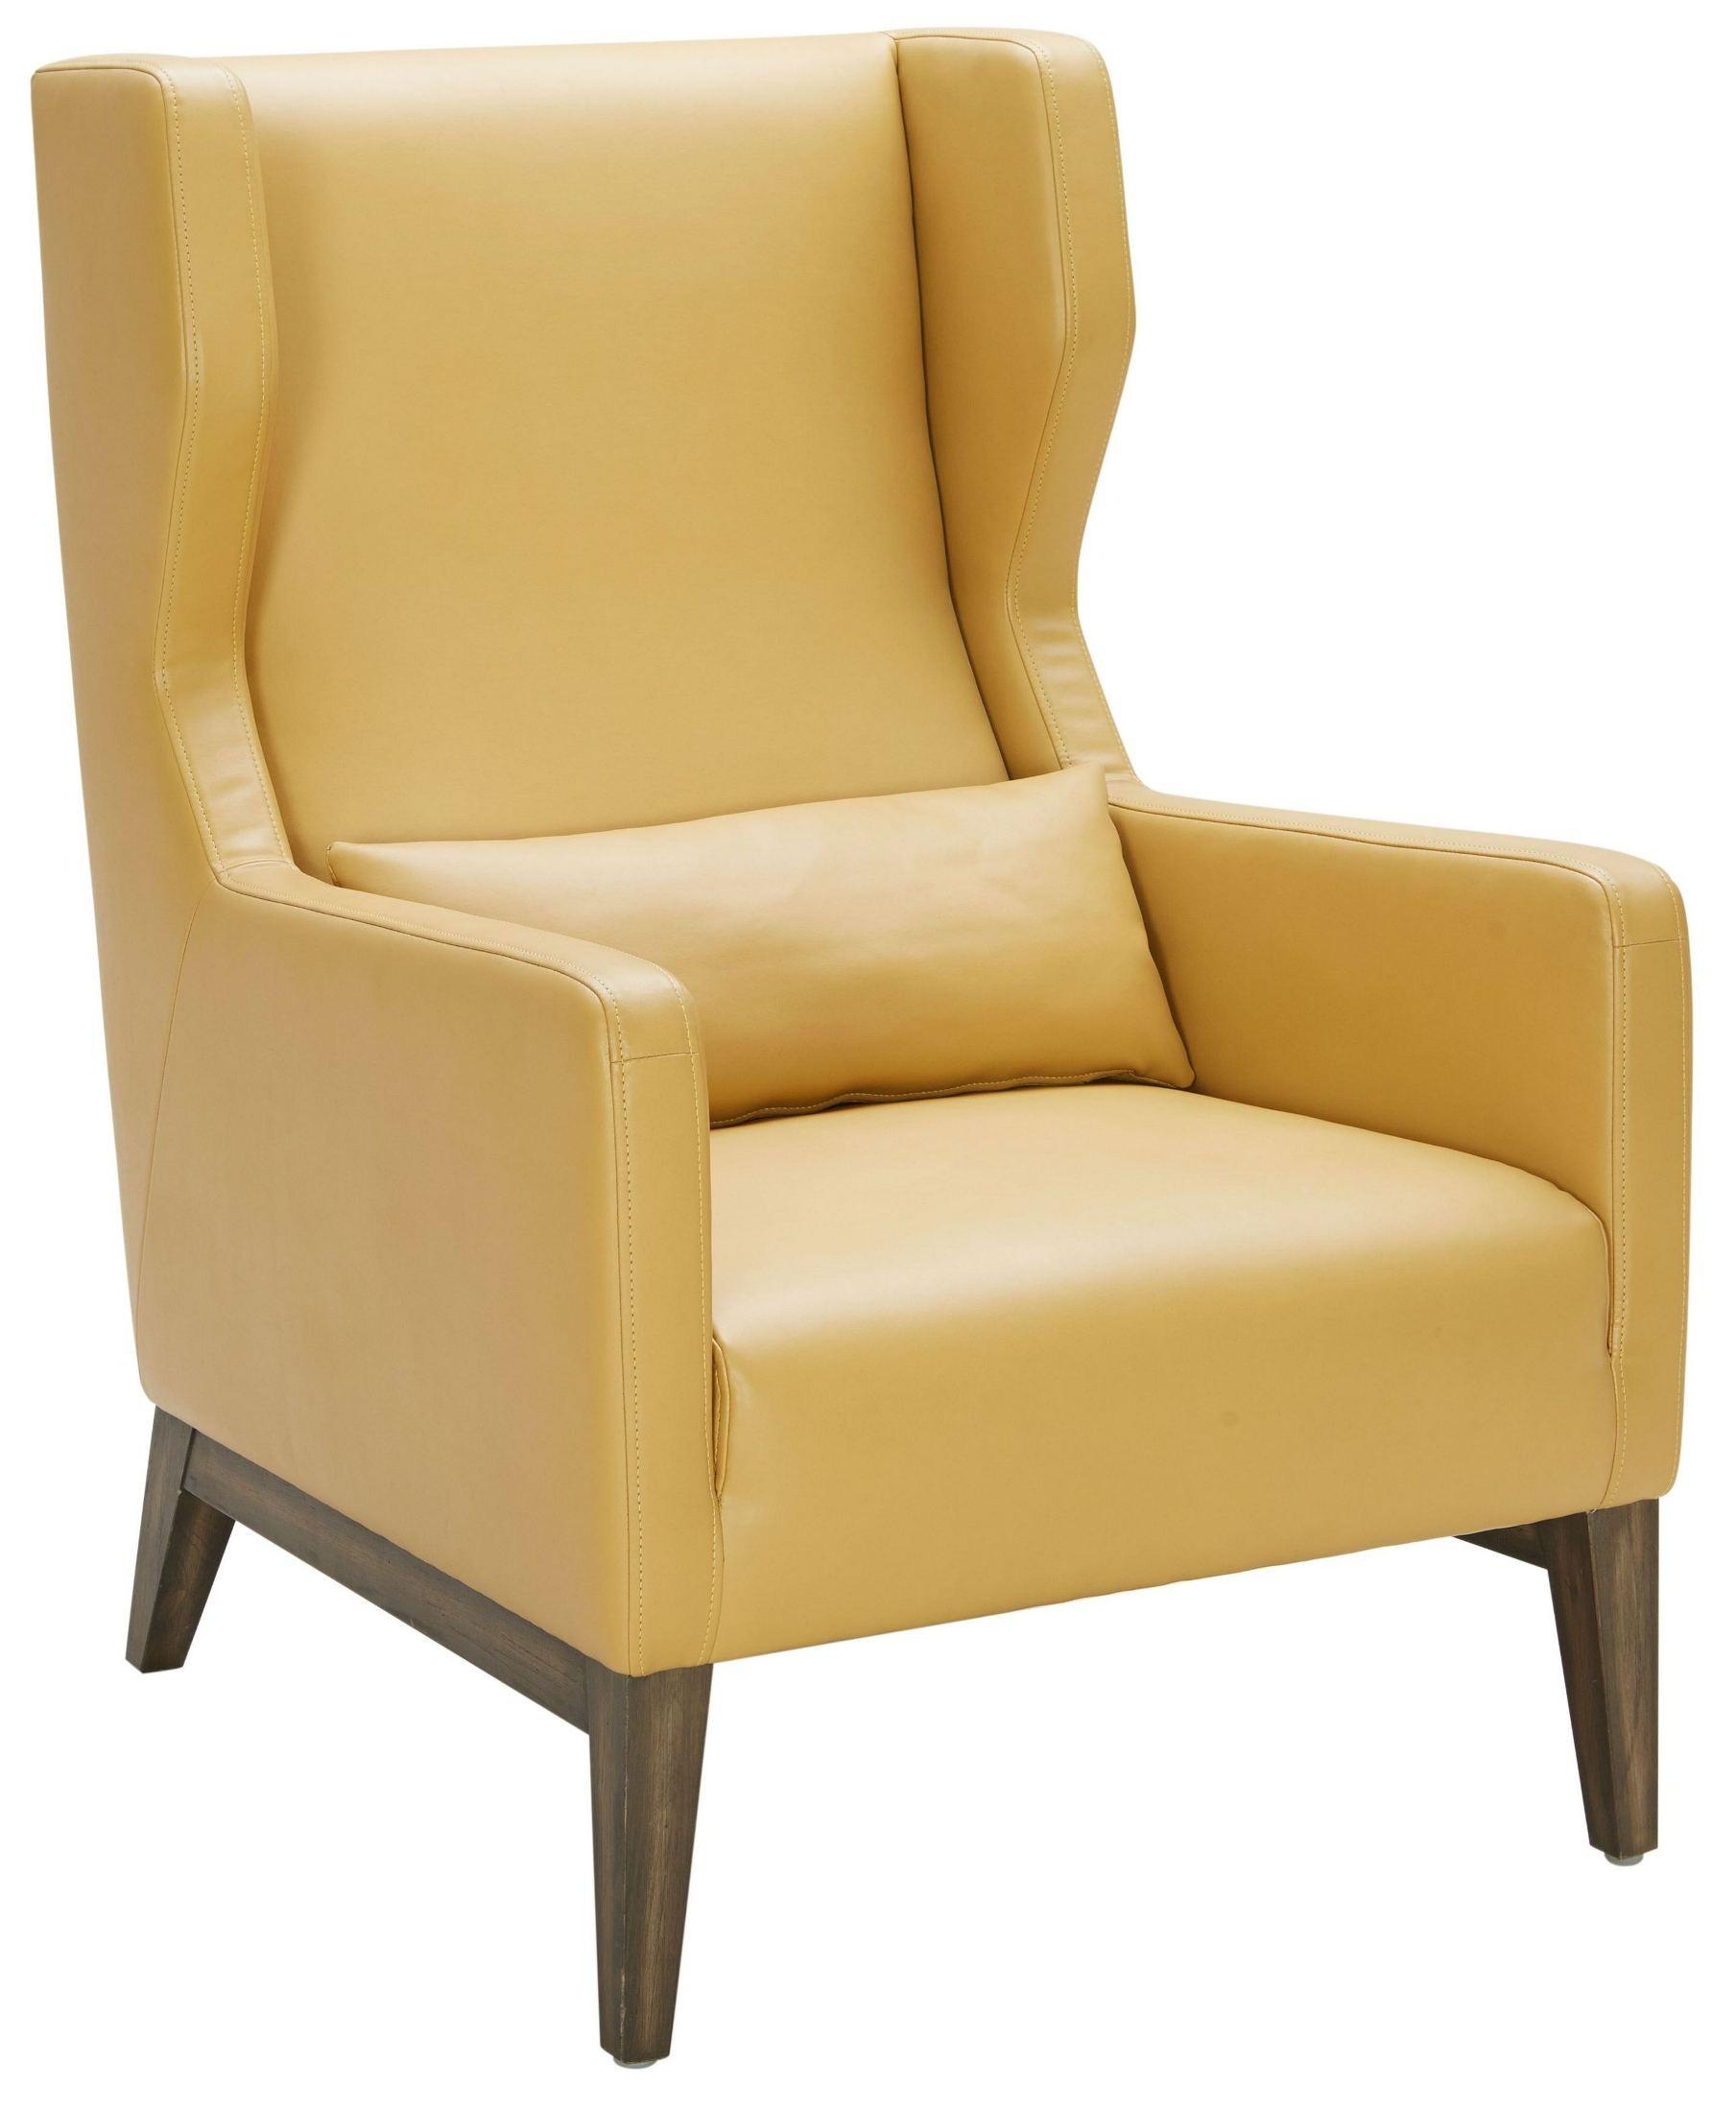 Messina Mustard Leather Armchair From Sunpan Coleman